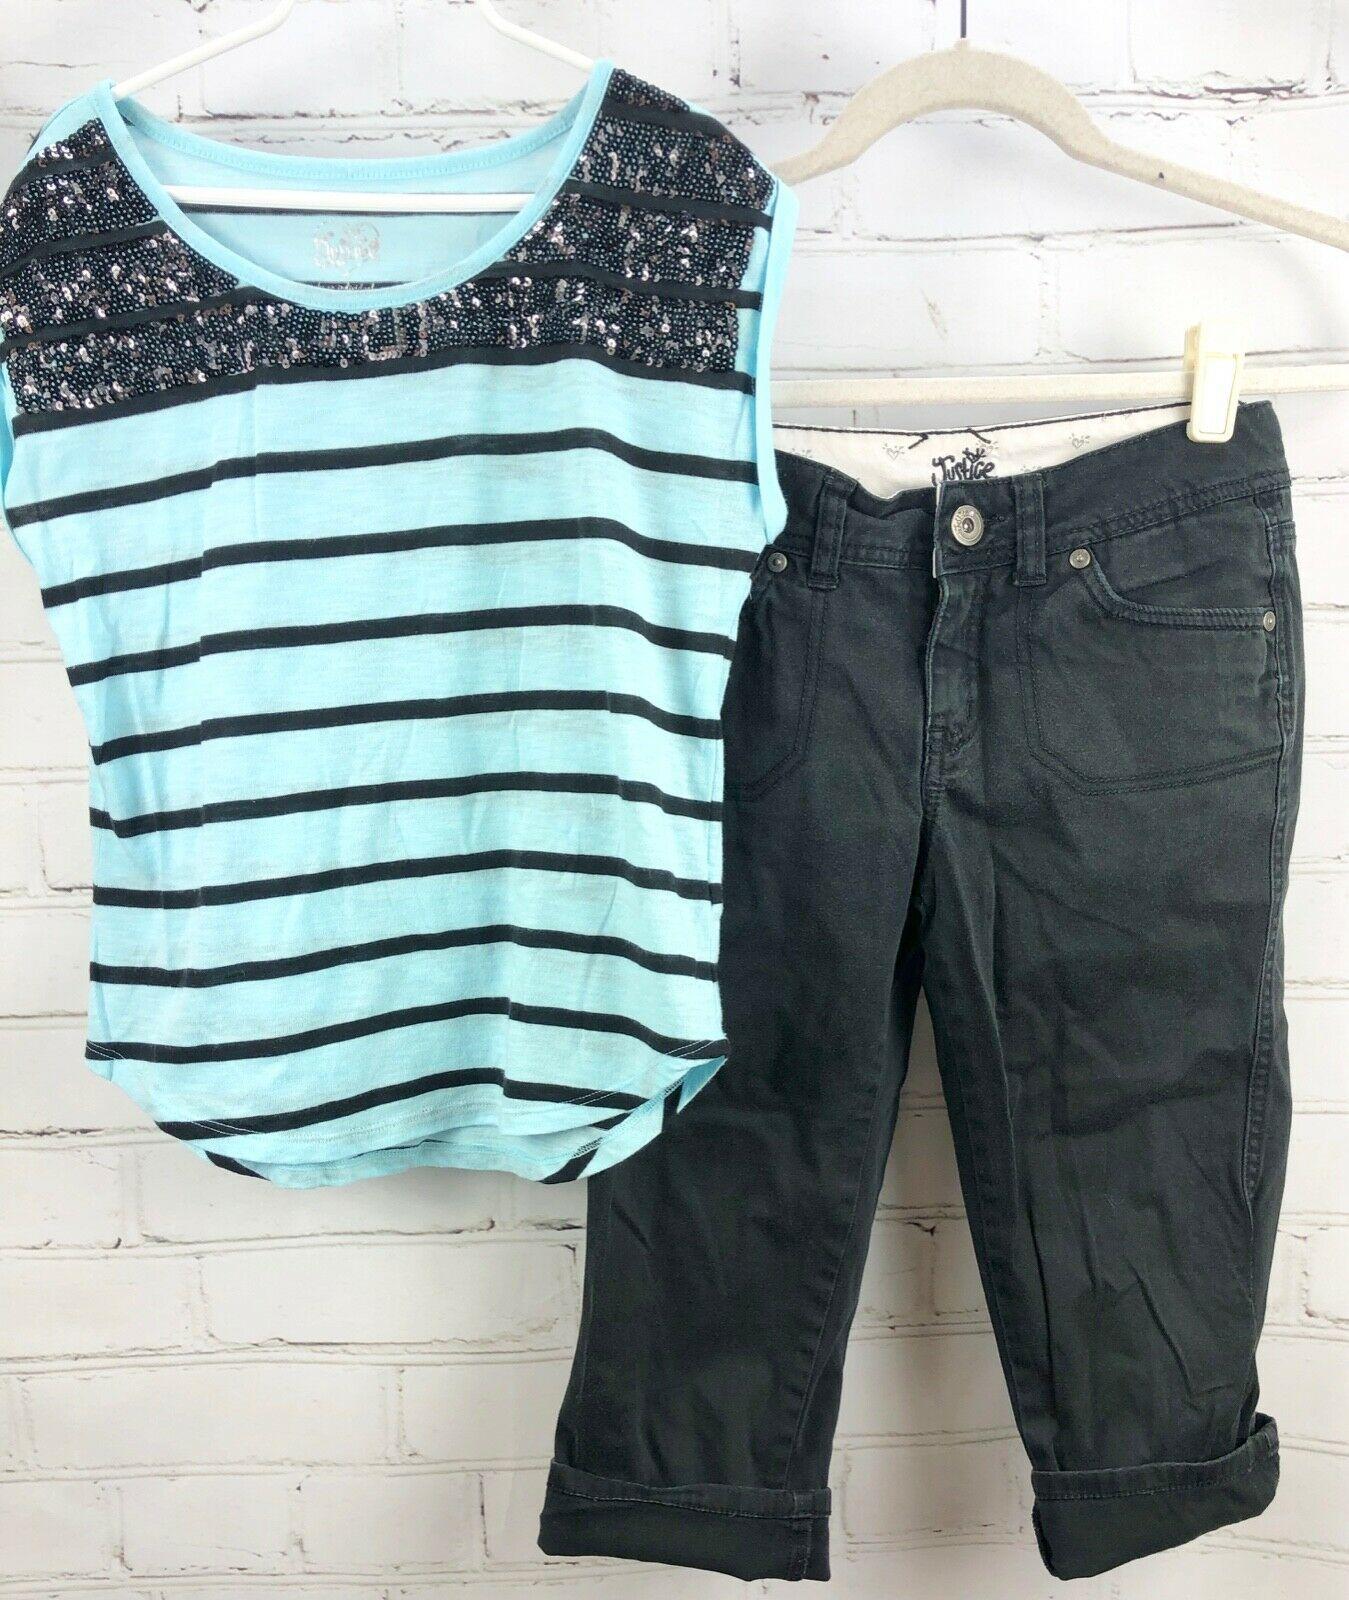 JUSTICE Beaded Stripe Top + Black Capri Pants Girls Size 12 Outfit Set